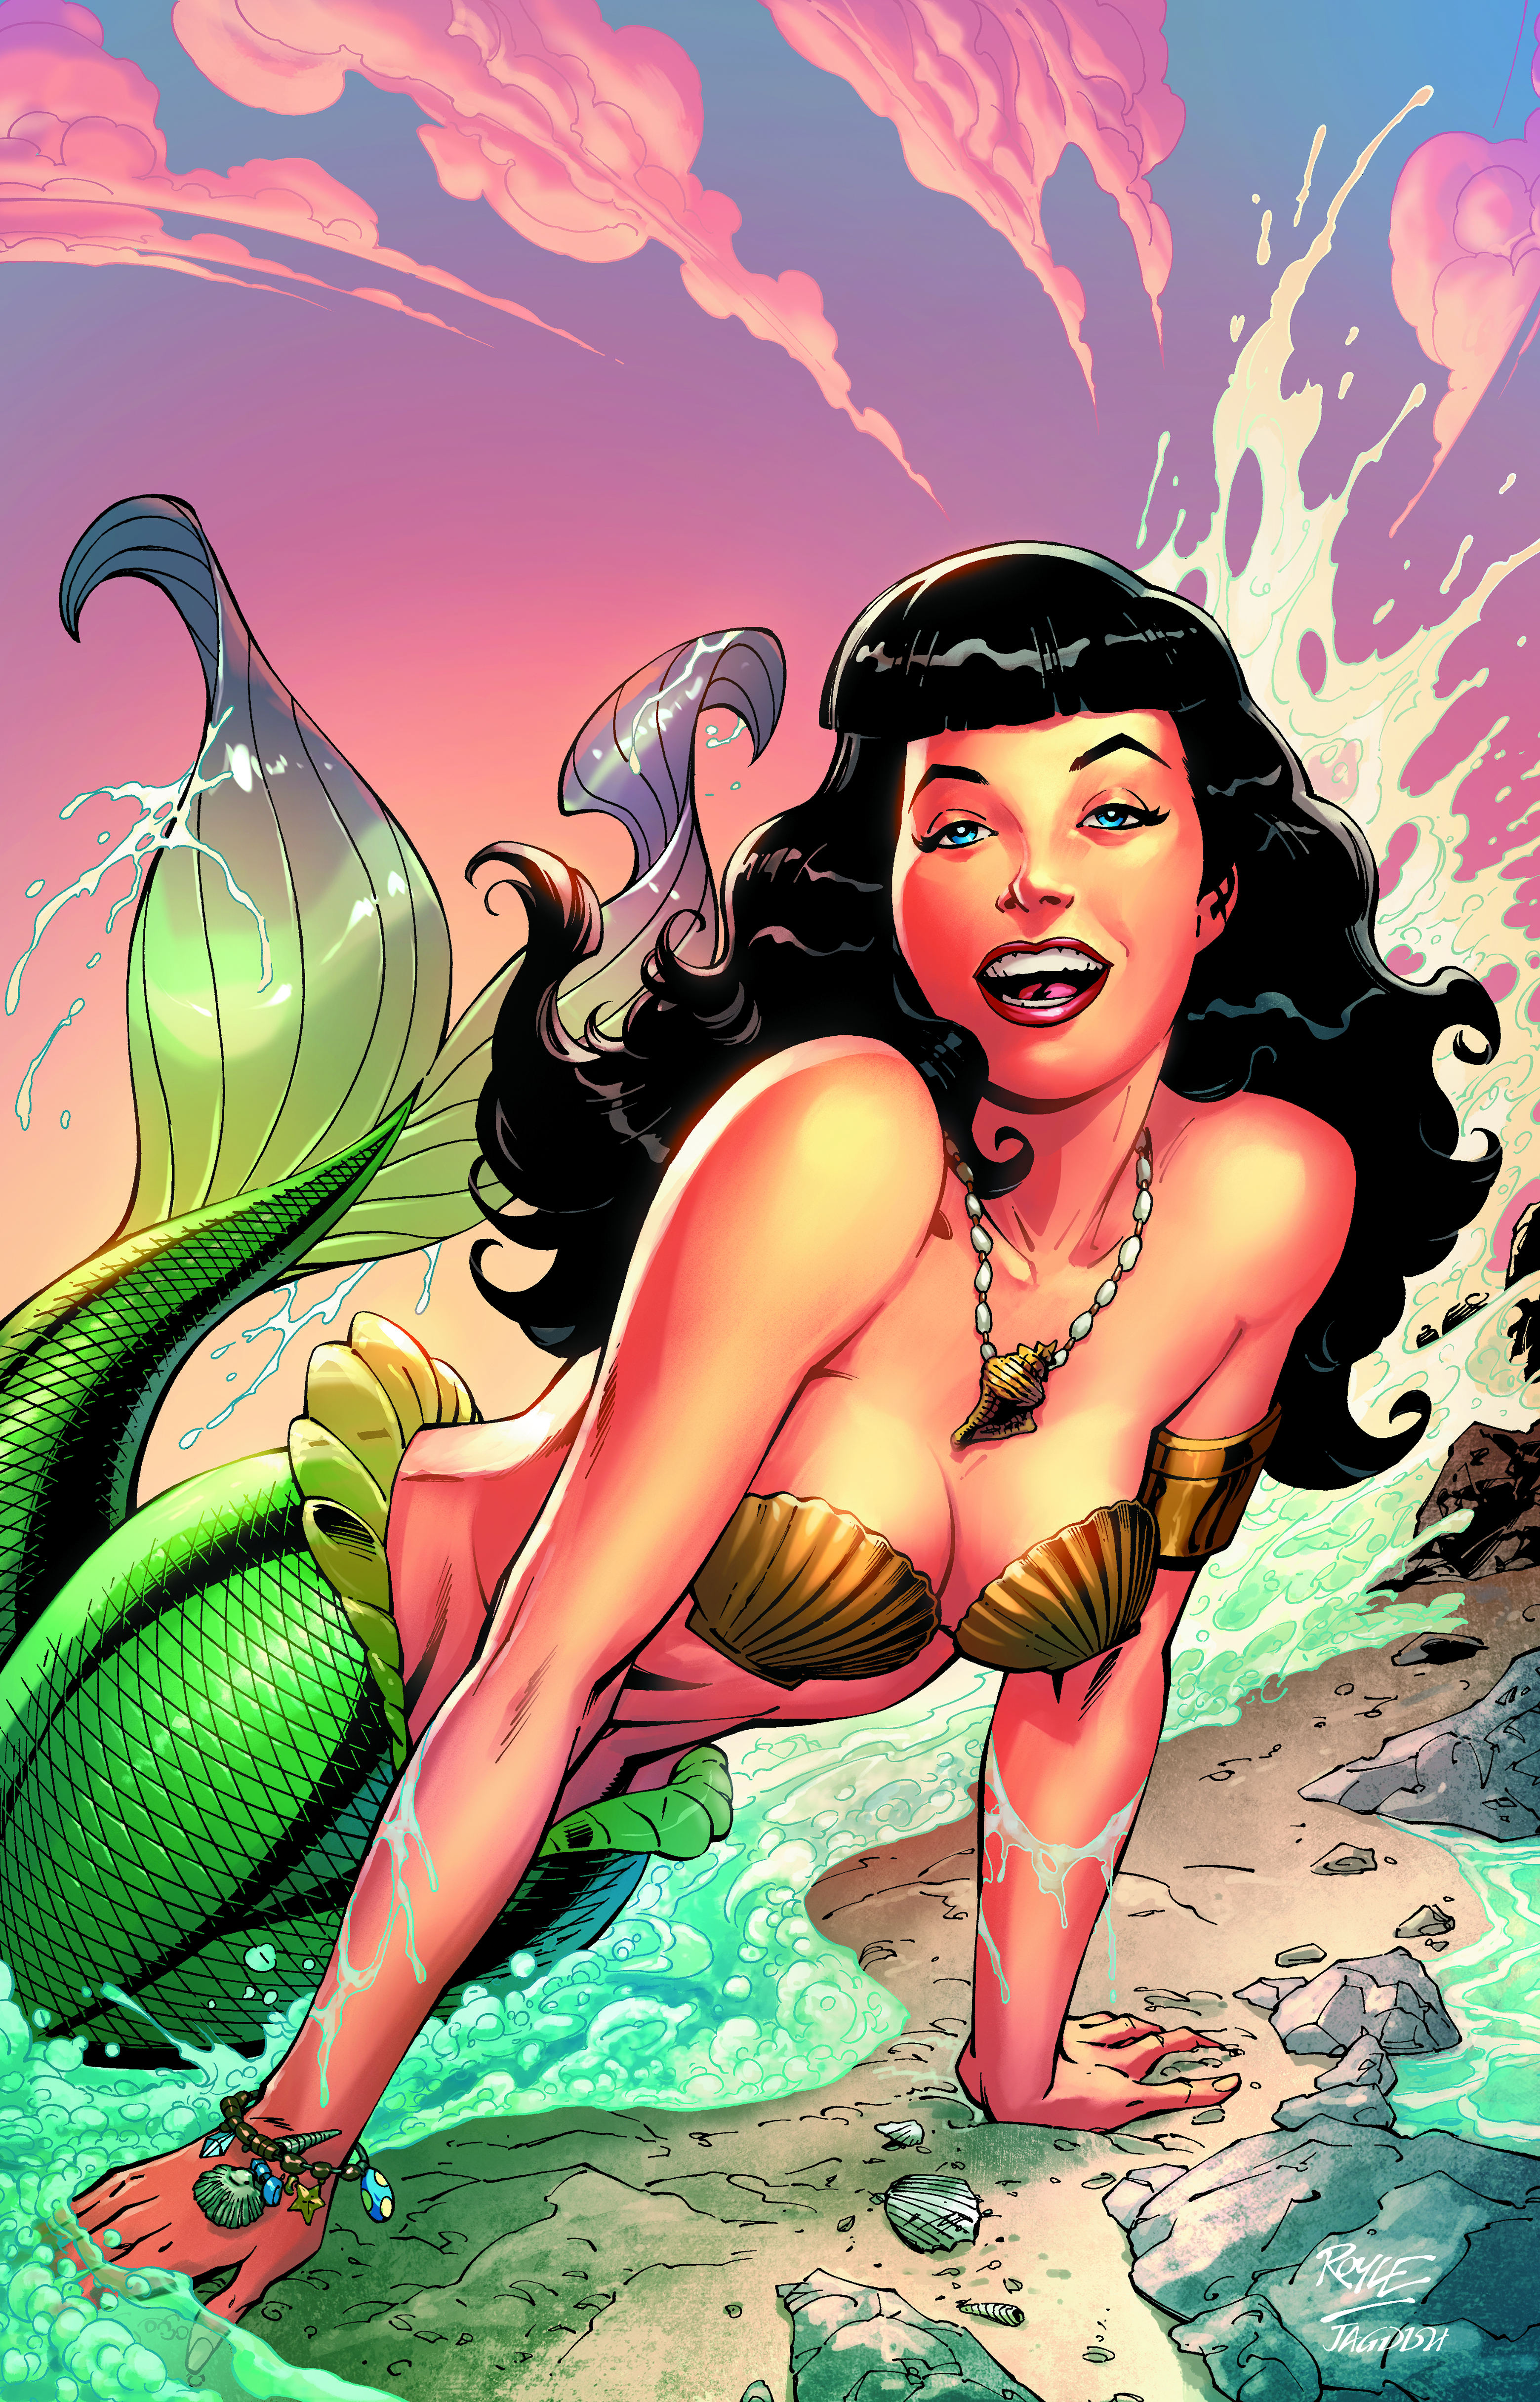 Bettie #04 Mermaid Cover final